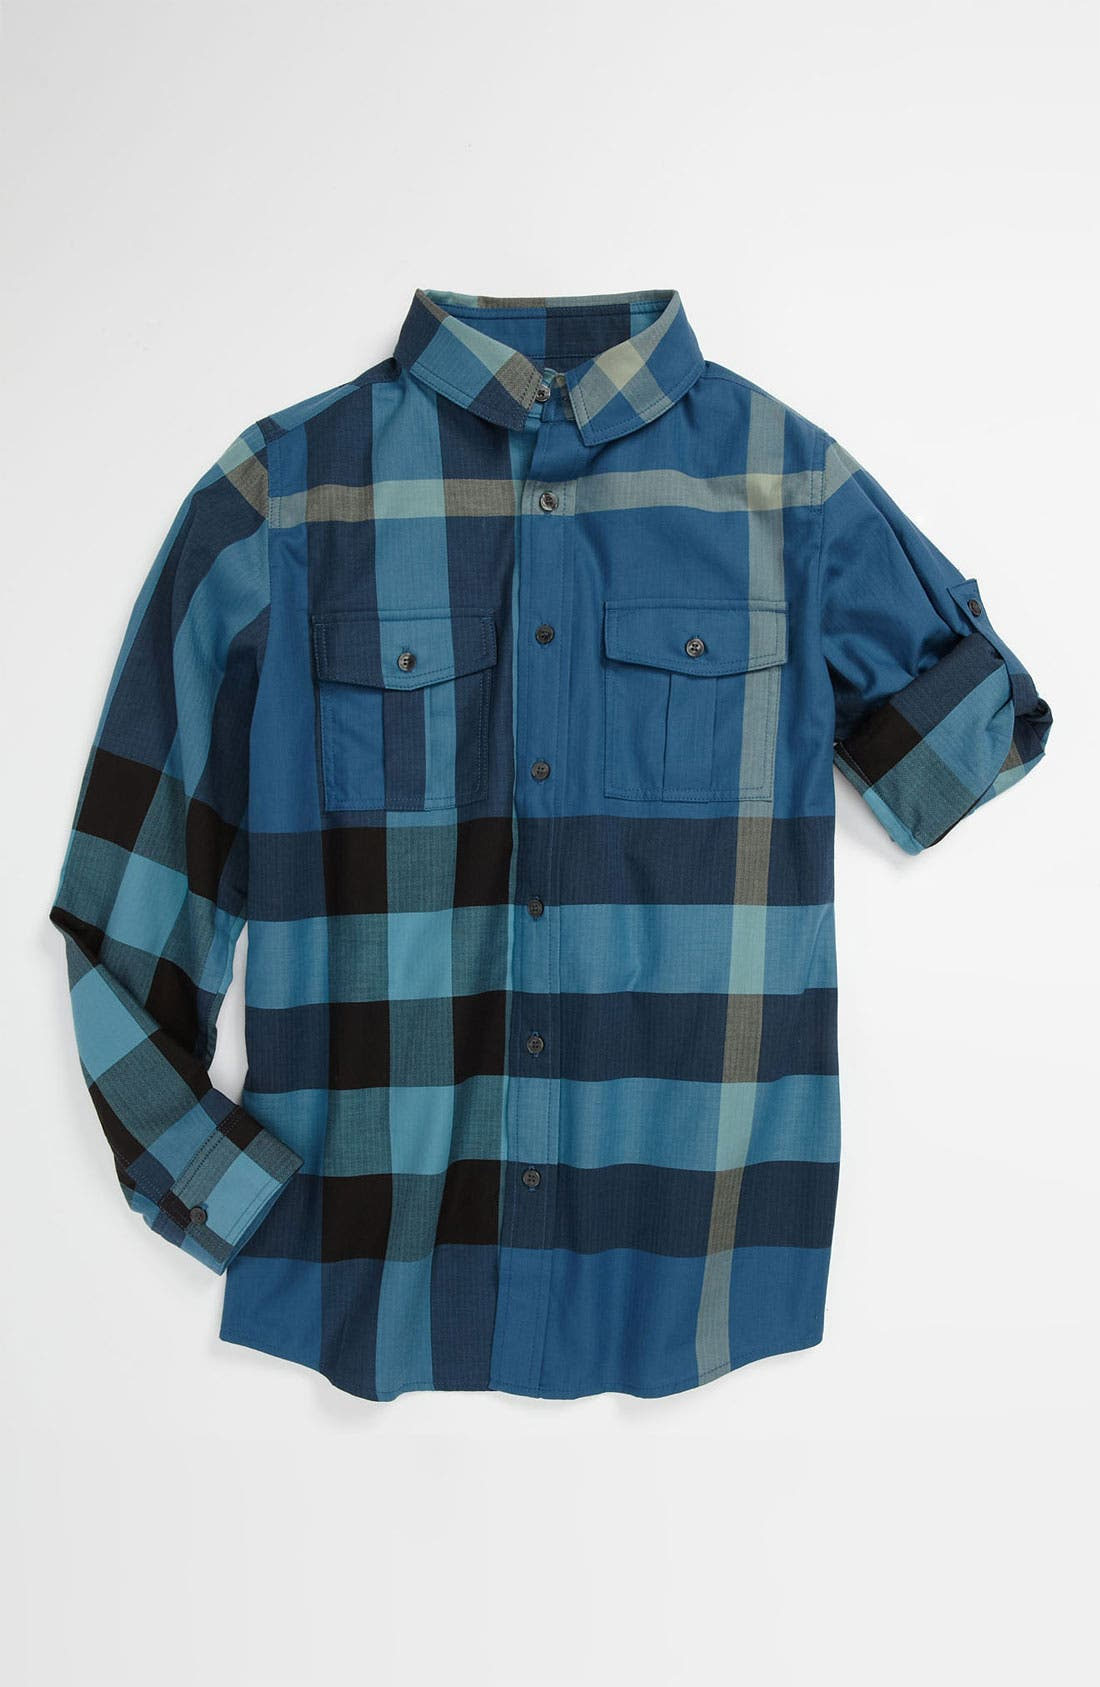 Alternate Image 1 Selected - Burberry 'Slough' Woven Shirt (Big Boys)